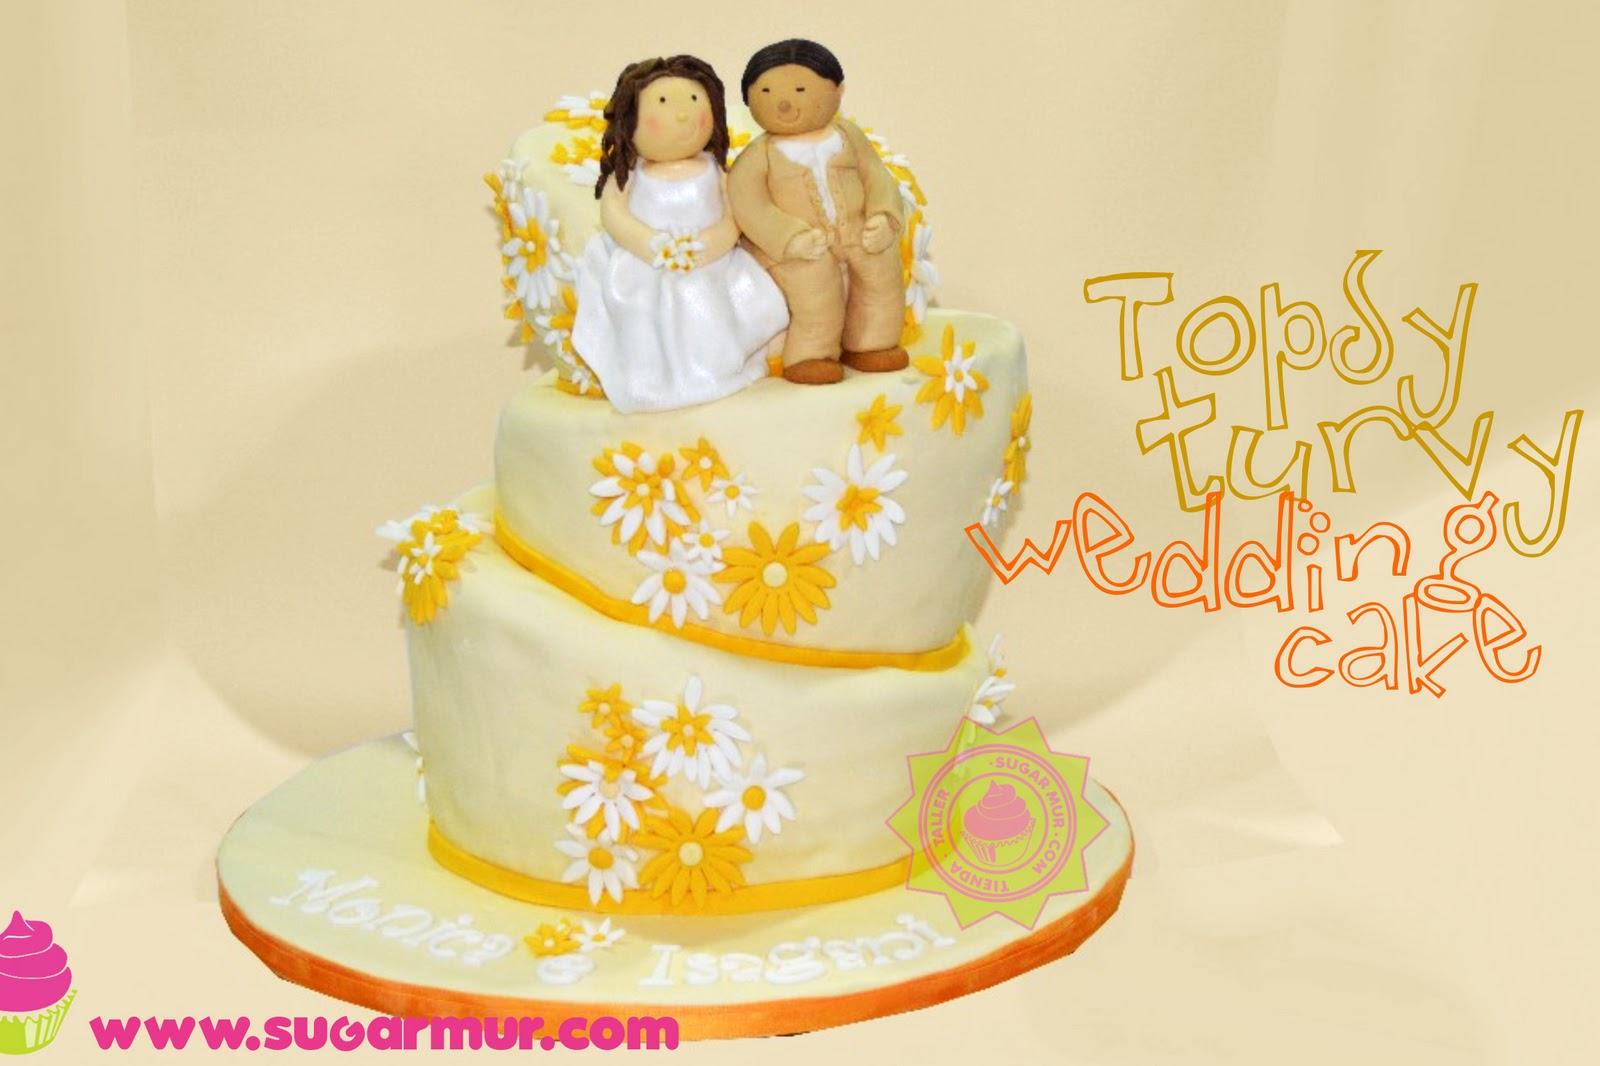 Topsy Turvy Wedding Cake | Sugar Mur